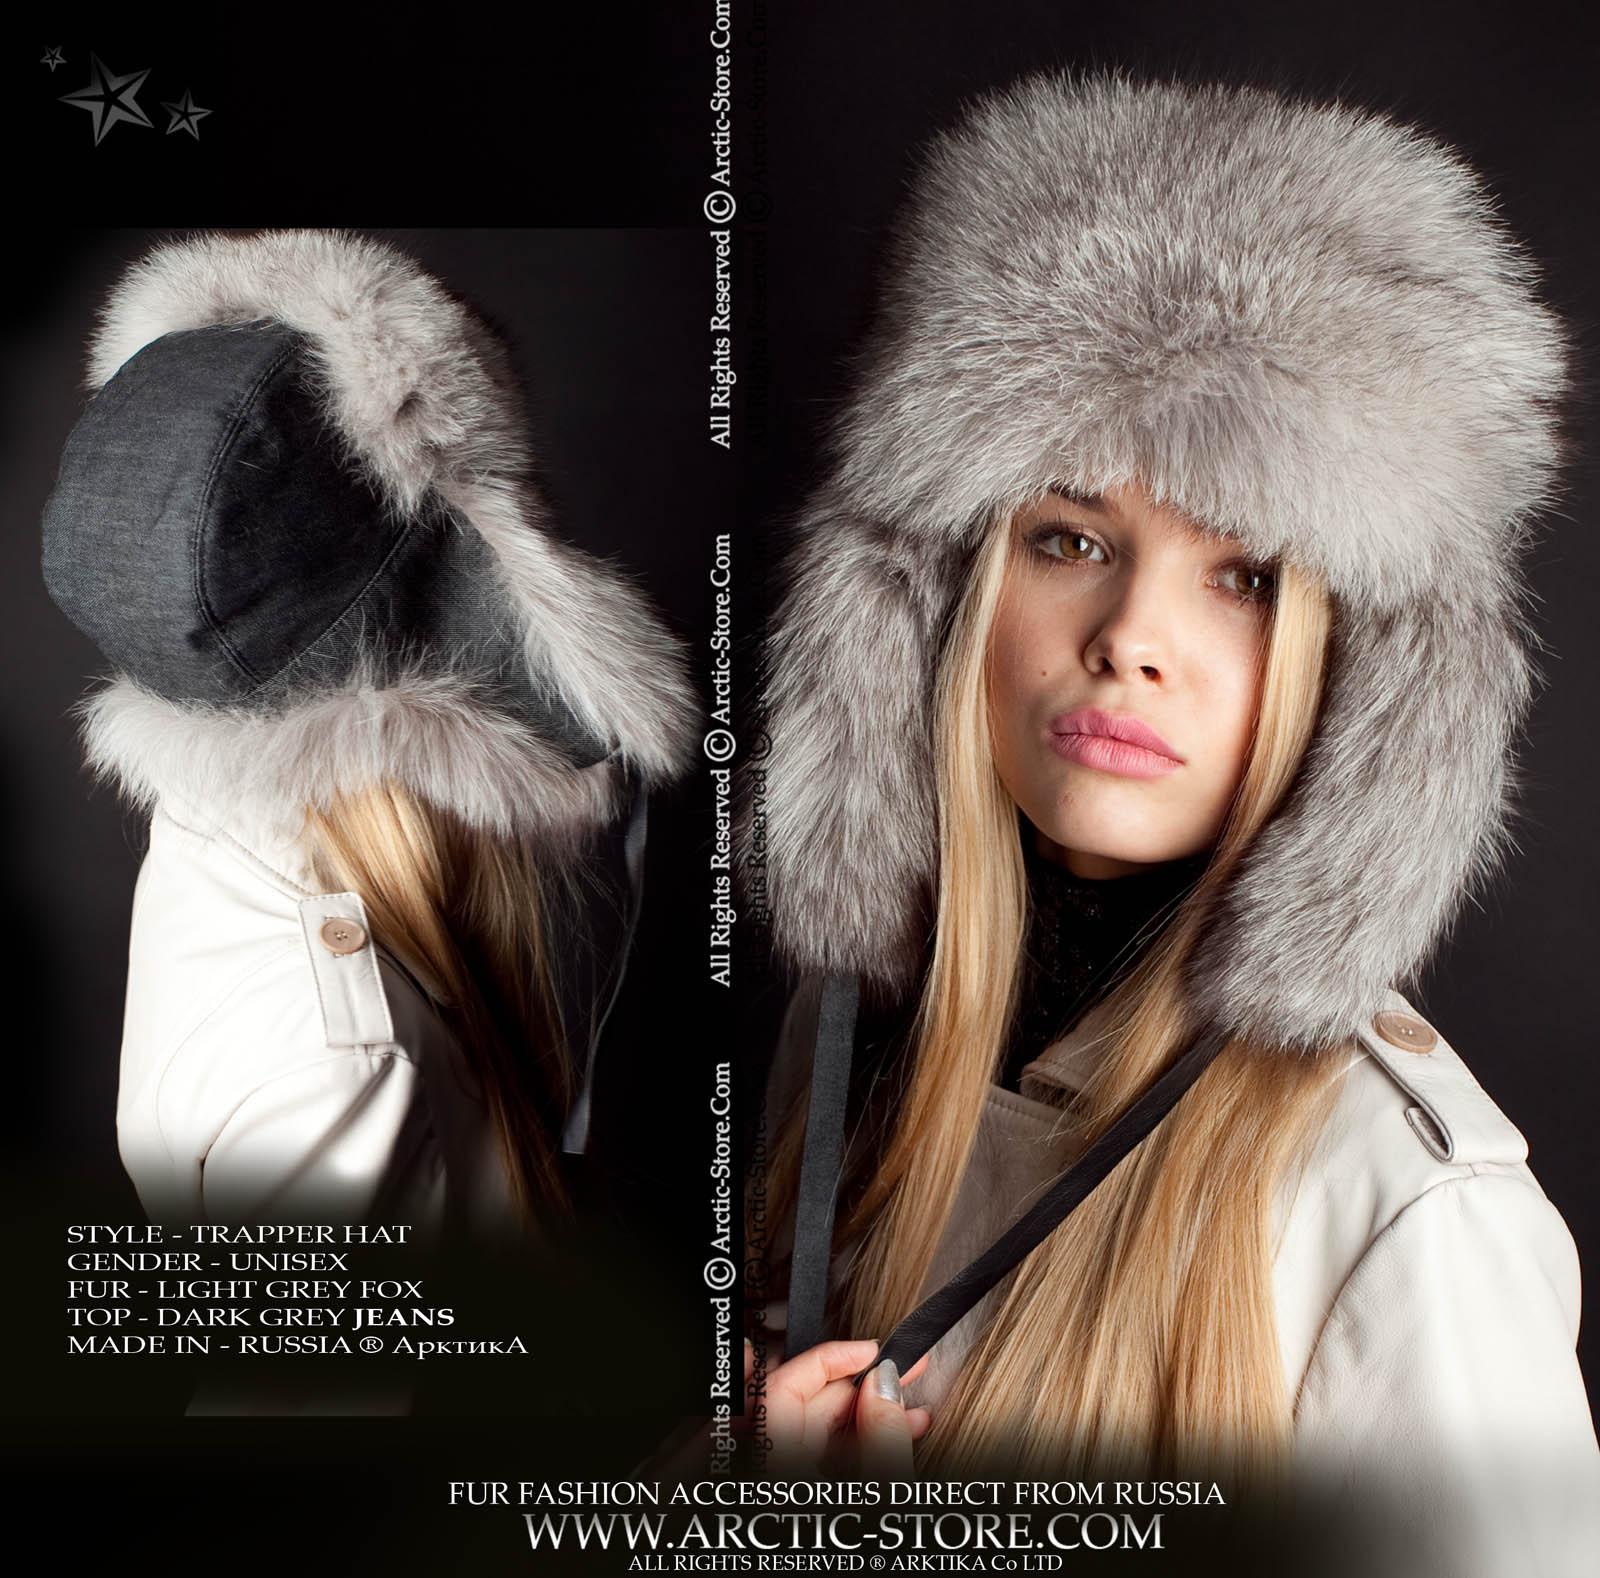 10e7f59a7 Ushanka Russian Trapper Bomber Aviator winter hats by Arctic-Store